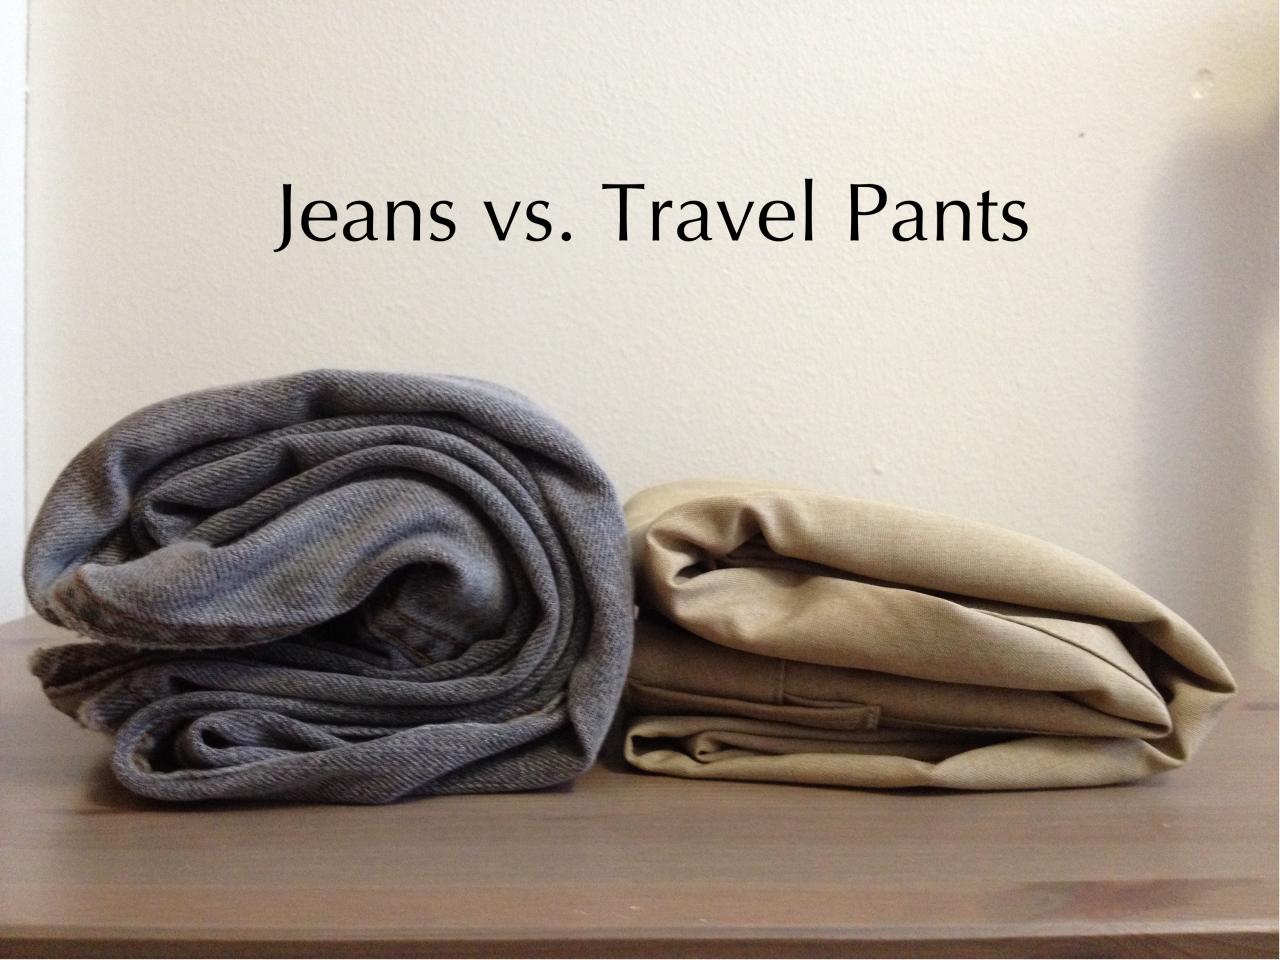 Jeans vs Travel Pants